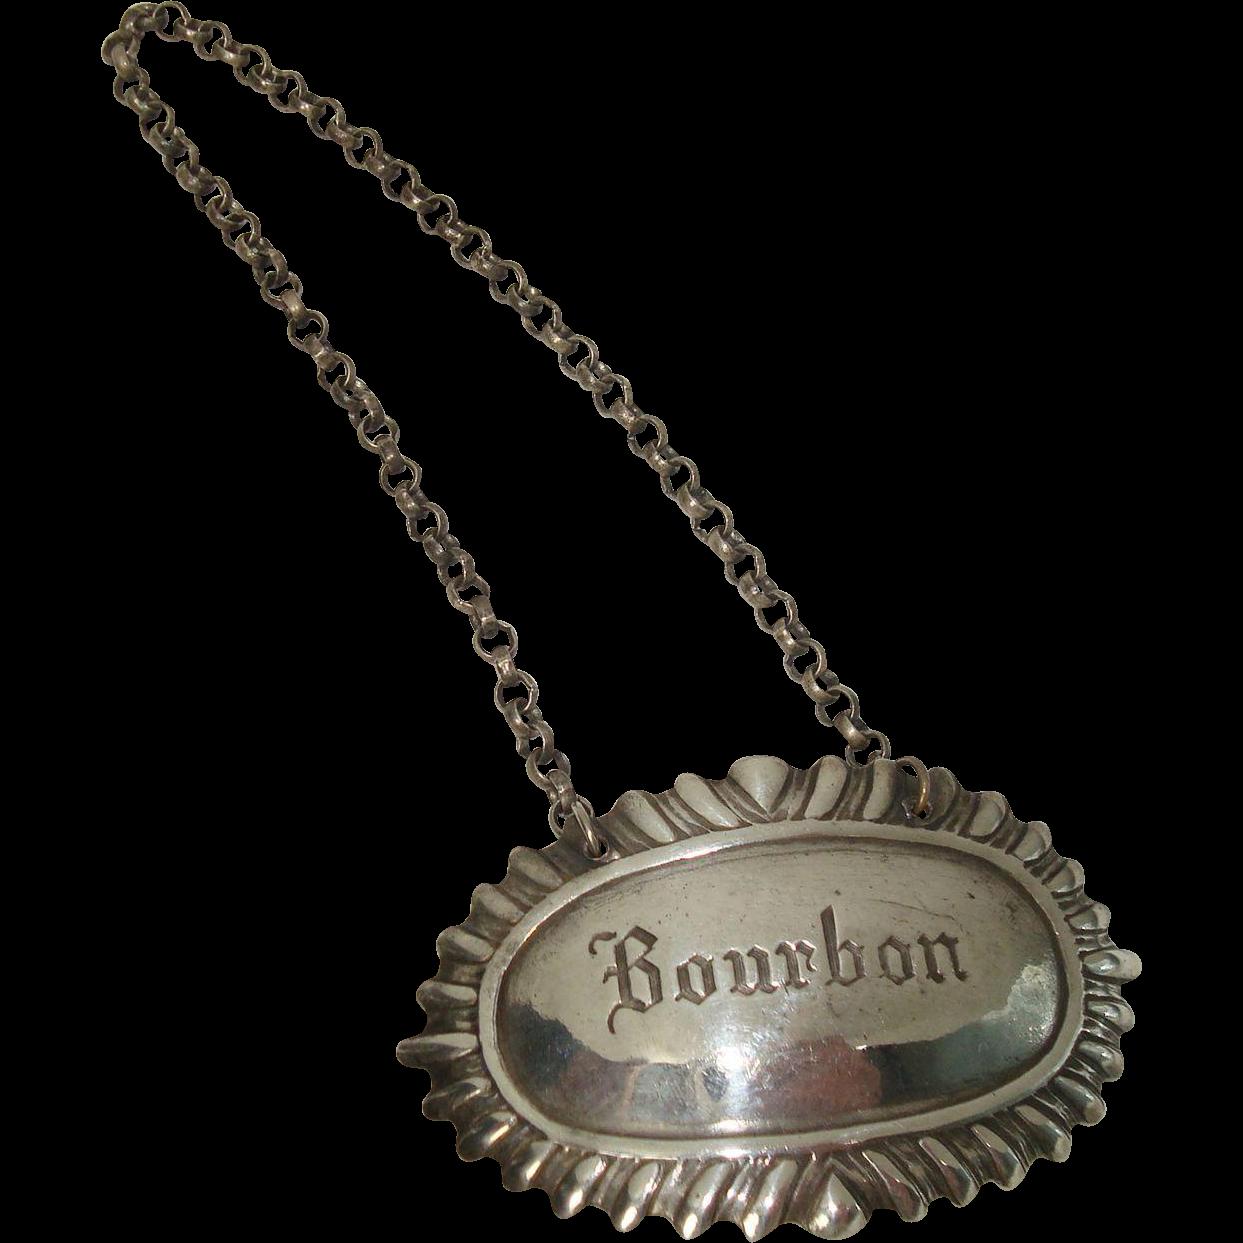 Bourbon Silver plate Decanter Label